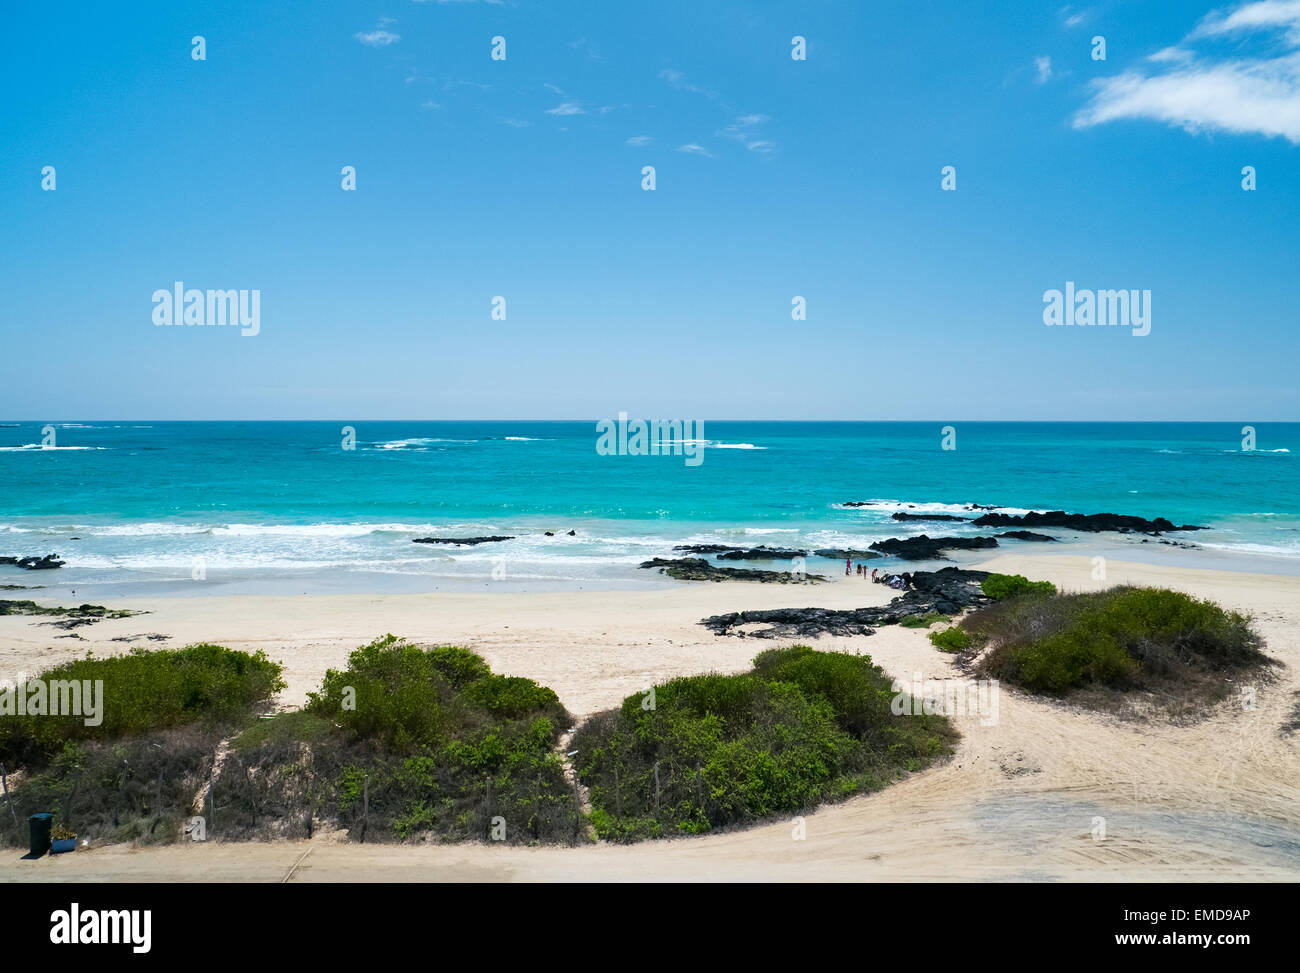 Beach on Galapagos Isabela island, Ecuador - Stock Image